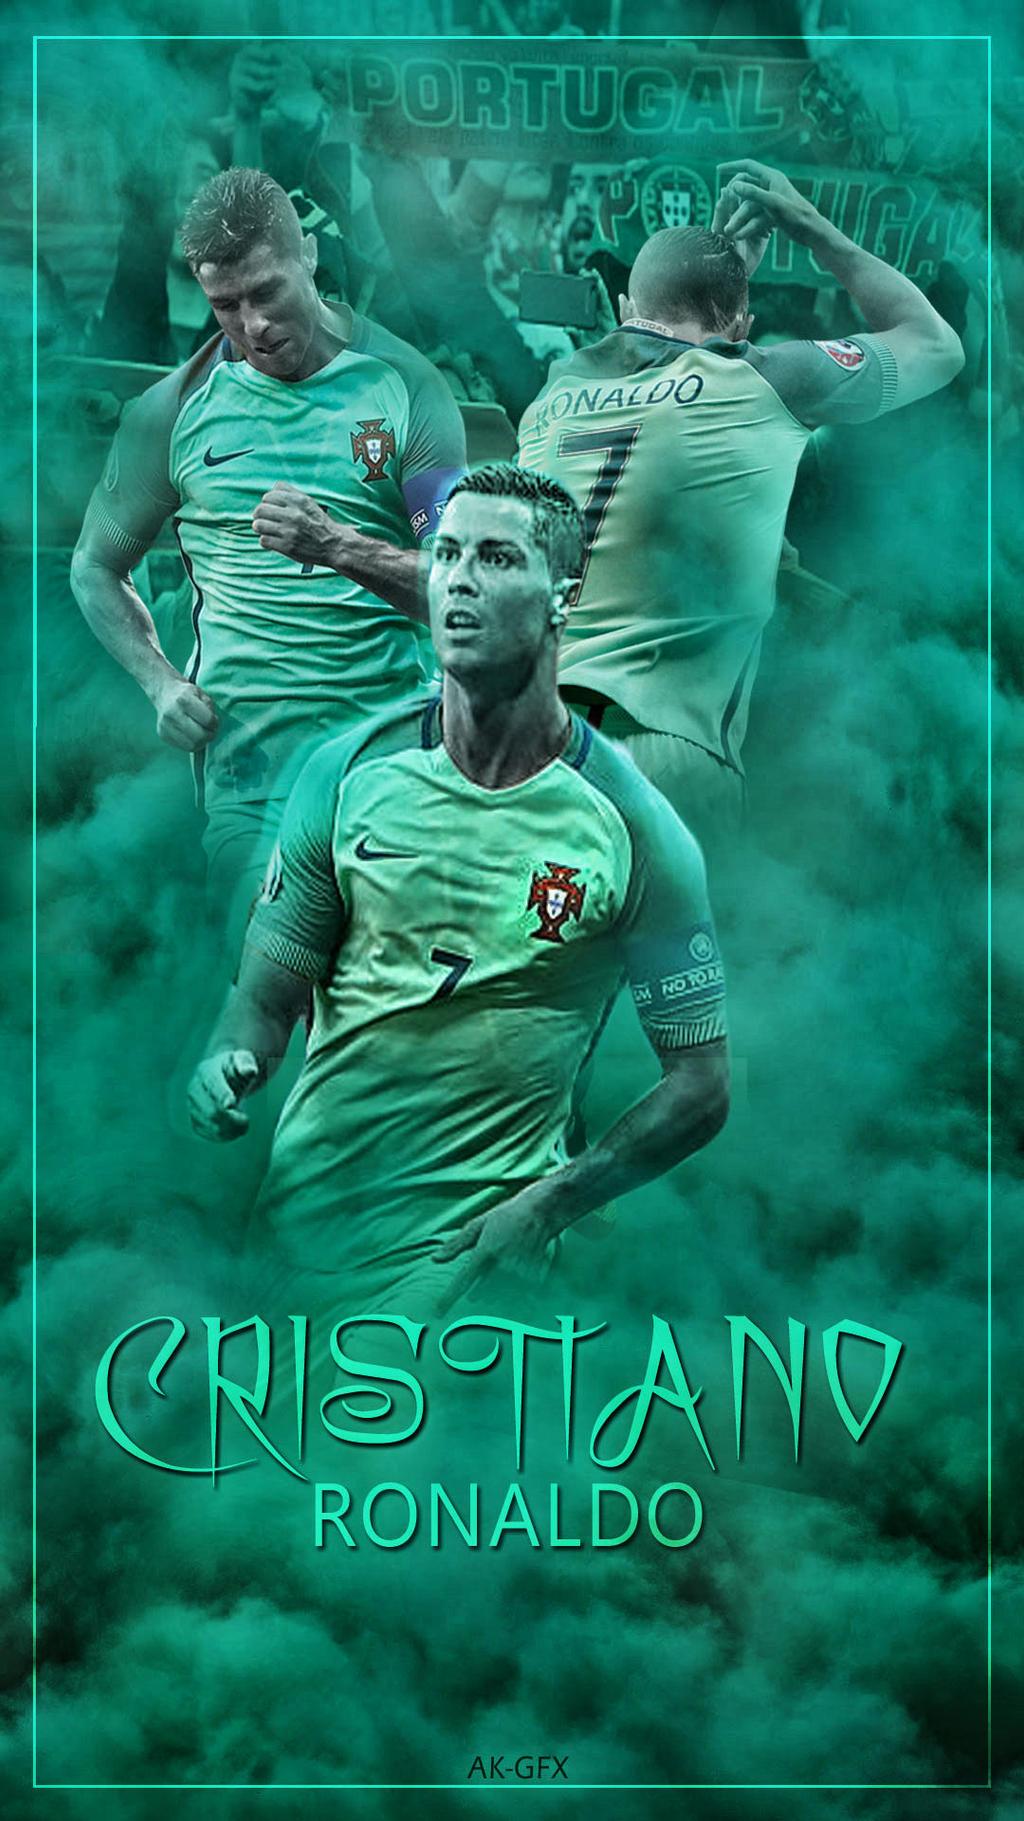 Cristiano Ronaldo Phone Wallpaper 2016 17 By Ghanibvb On Deviantart